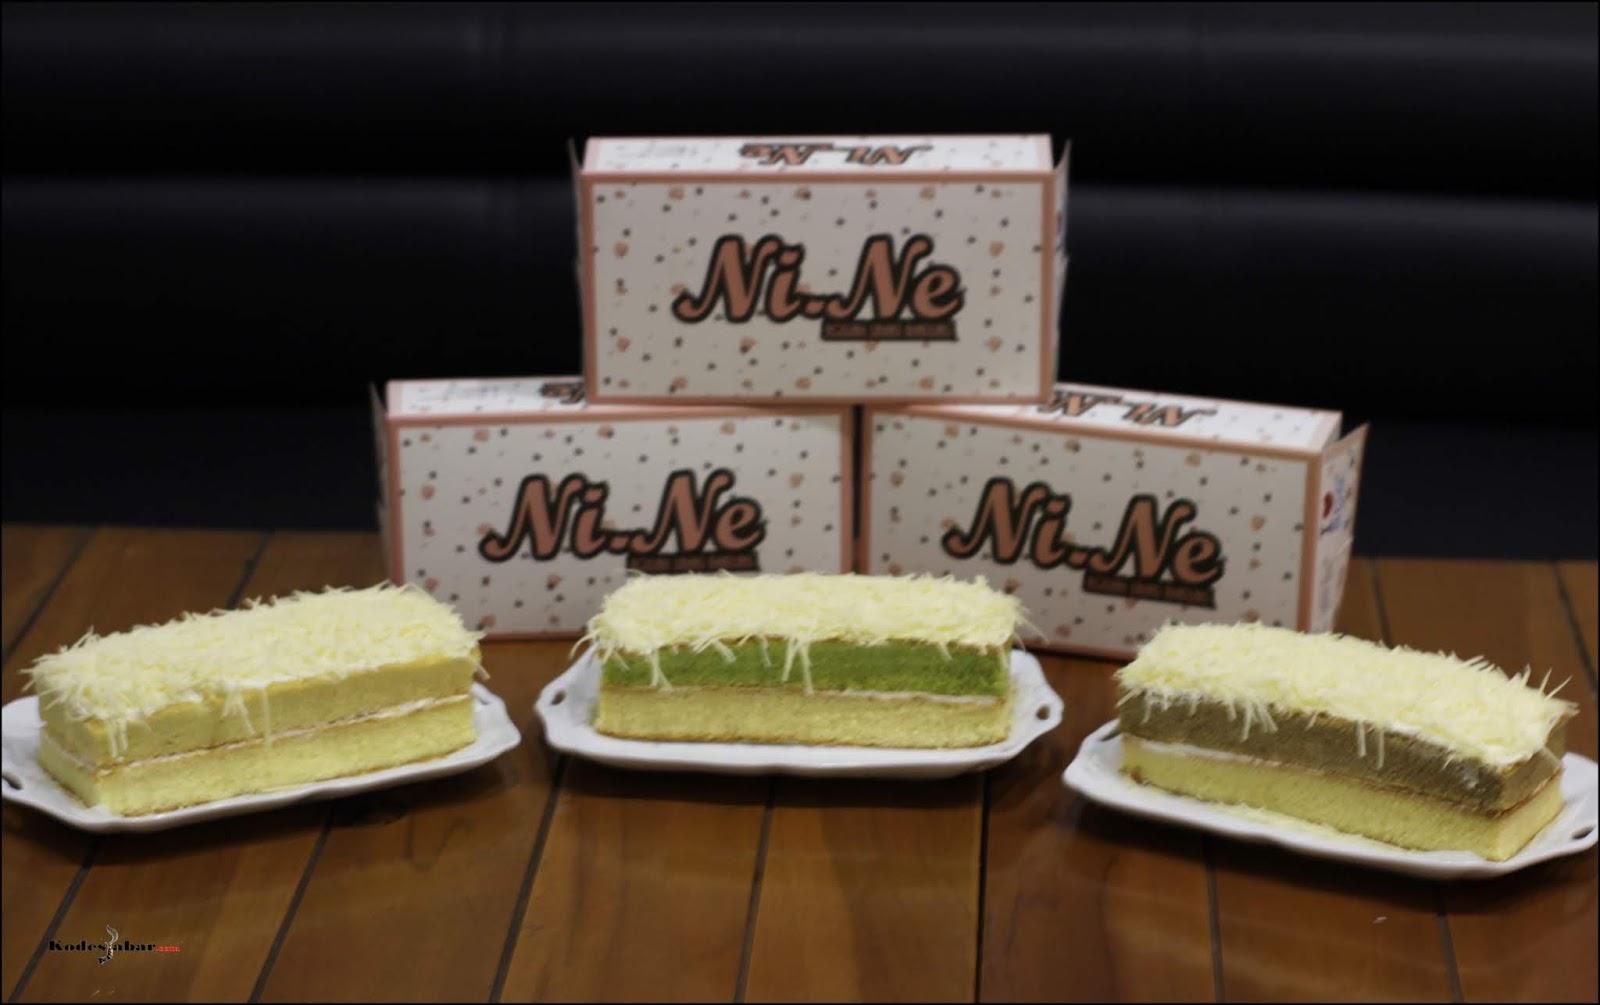 Ni.Ne Cheese Cake, Boluna Urang Bandung